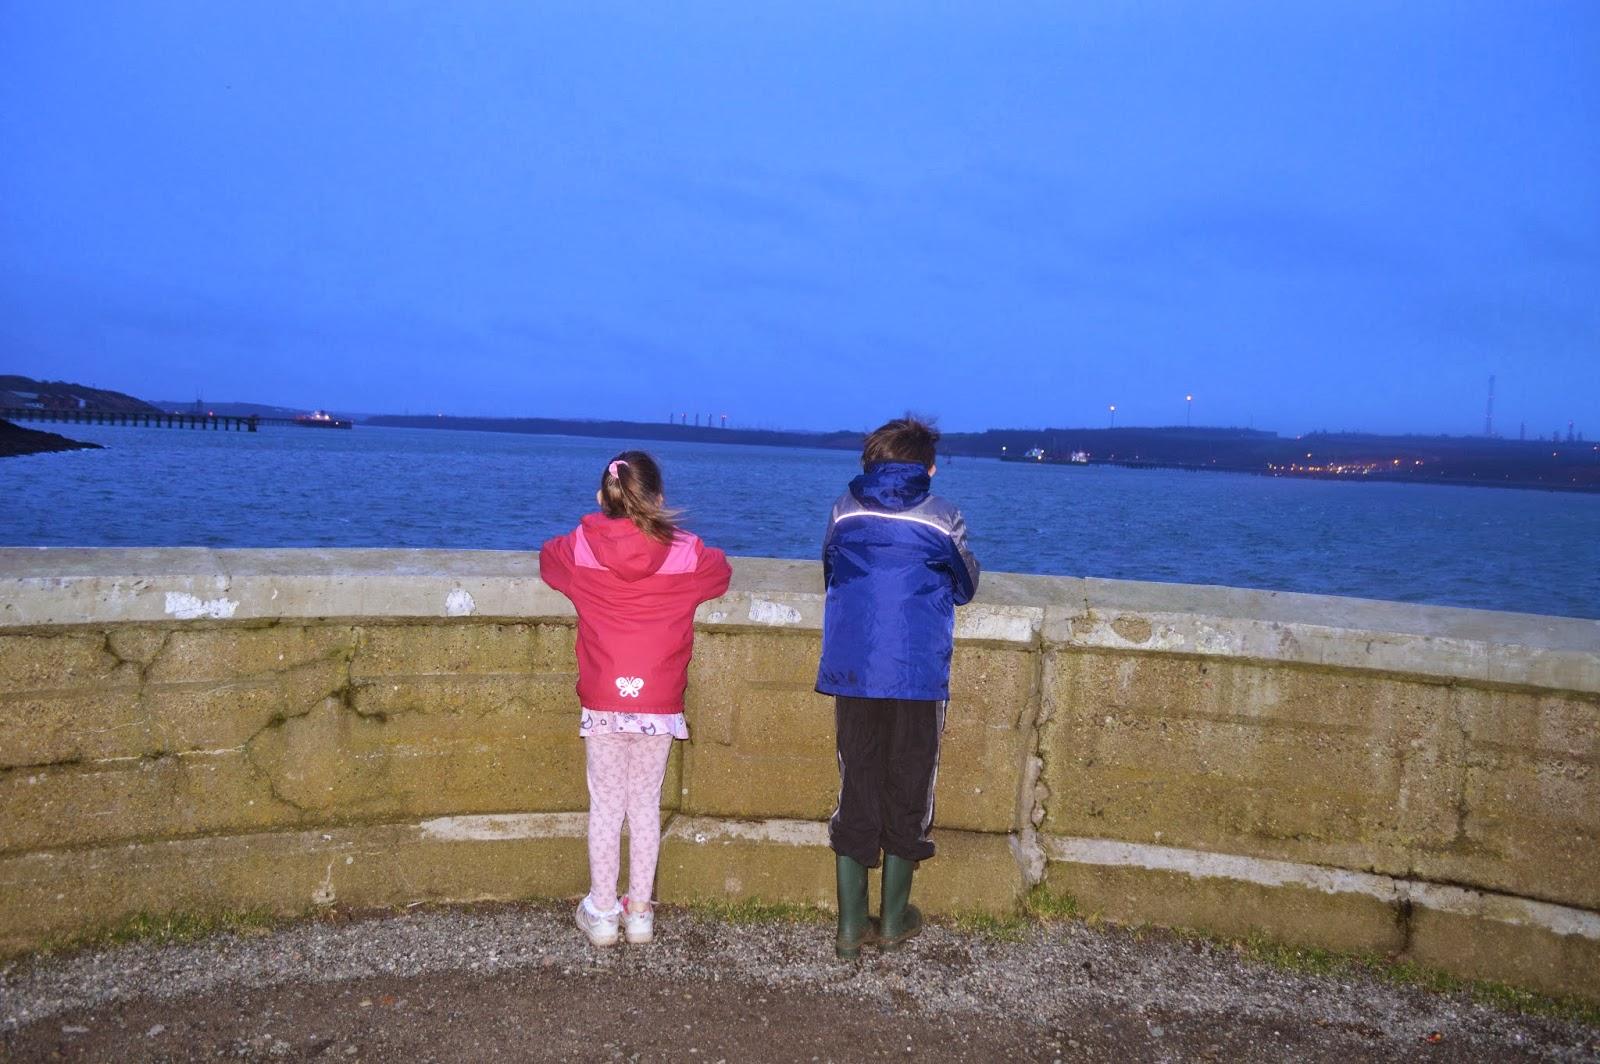 Milford Haven Port Marina The Docks